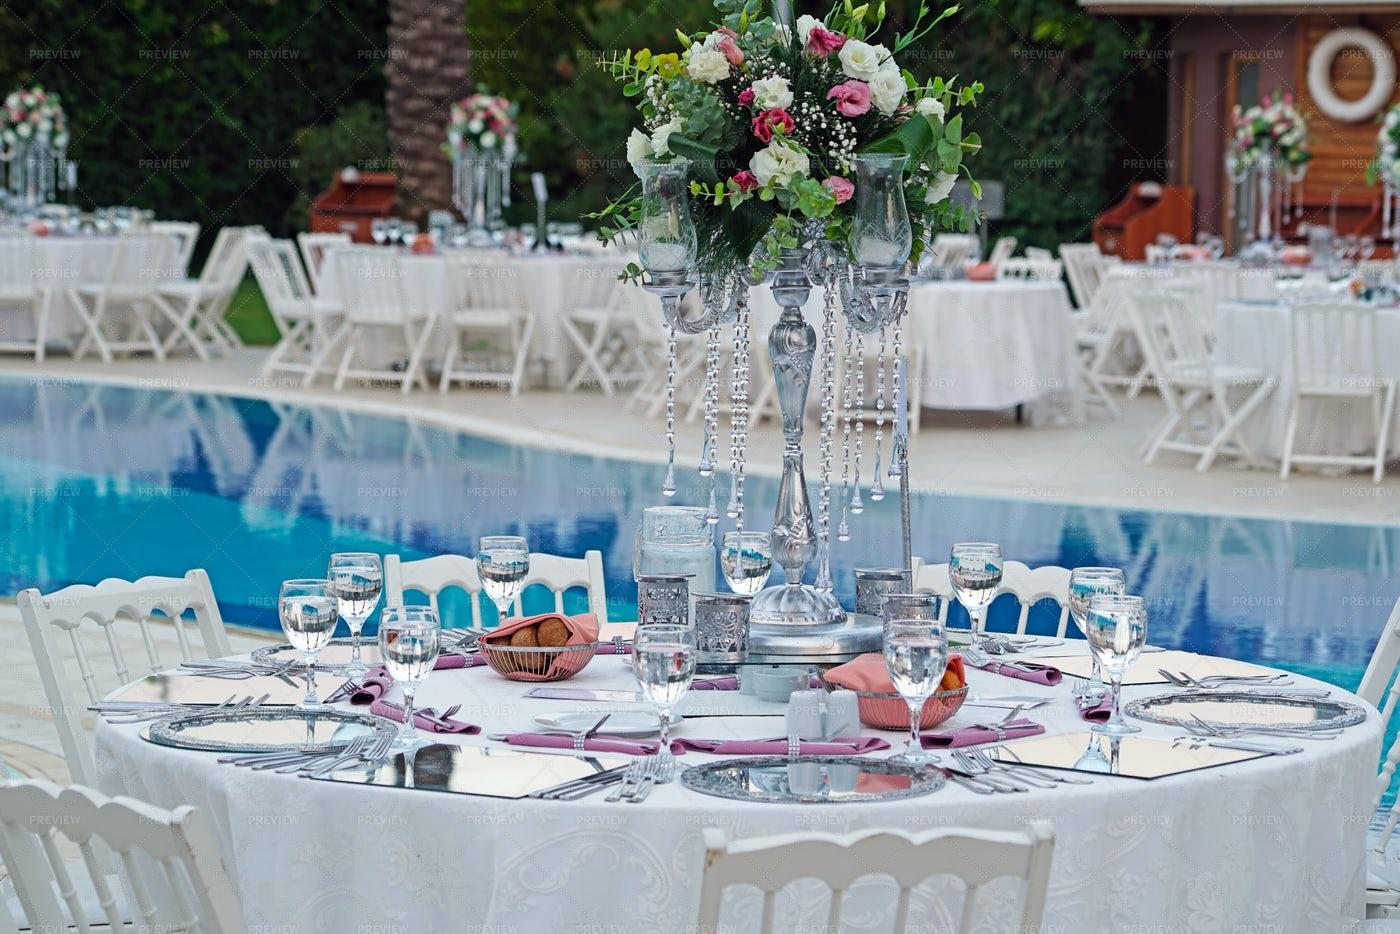 Laid Wedding Reception Table: Stock Photos